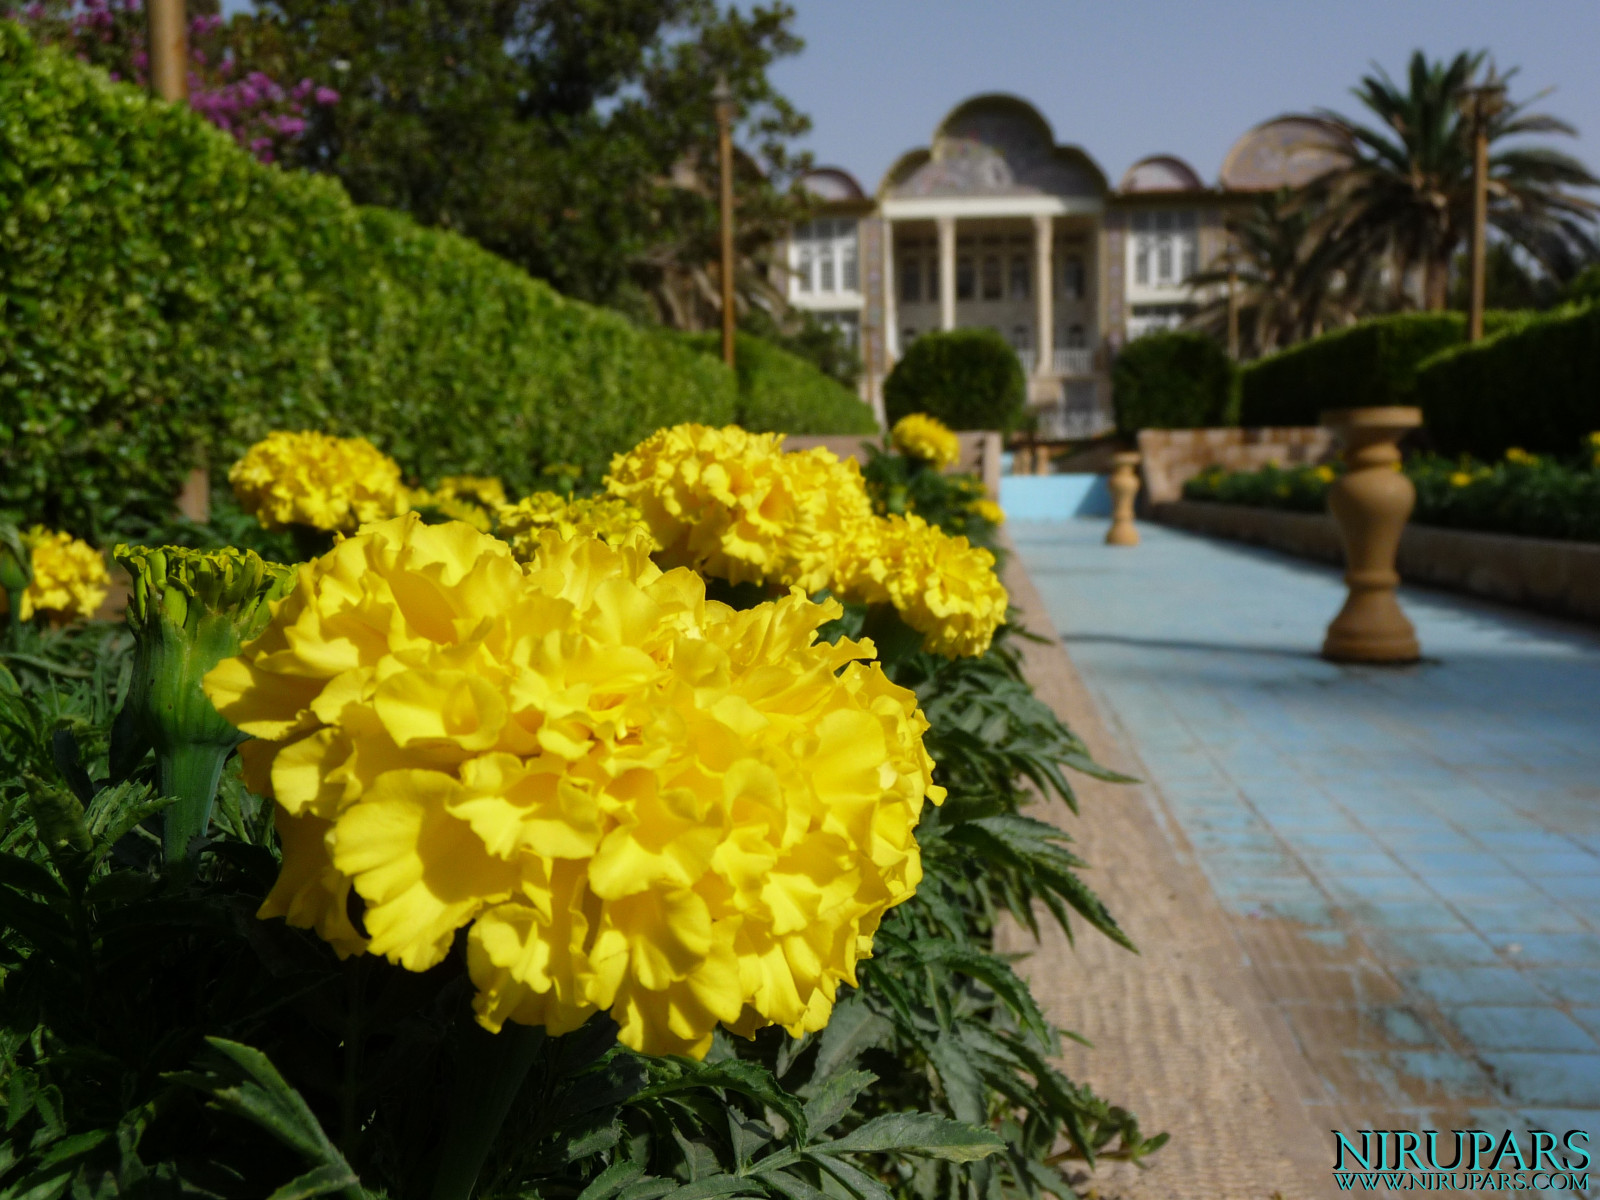 Baq-e Eram - Building - Fountain